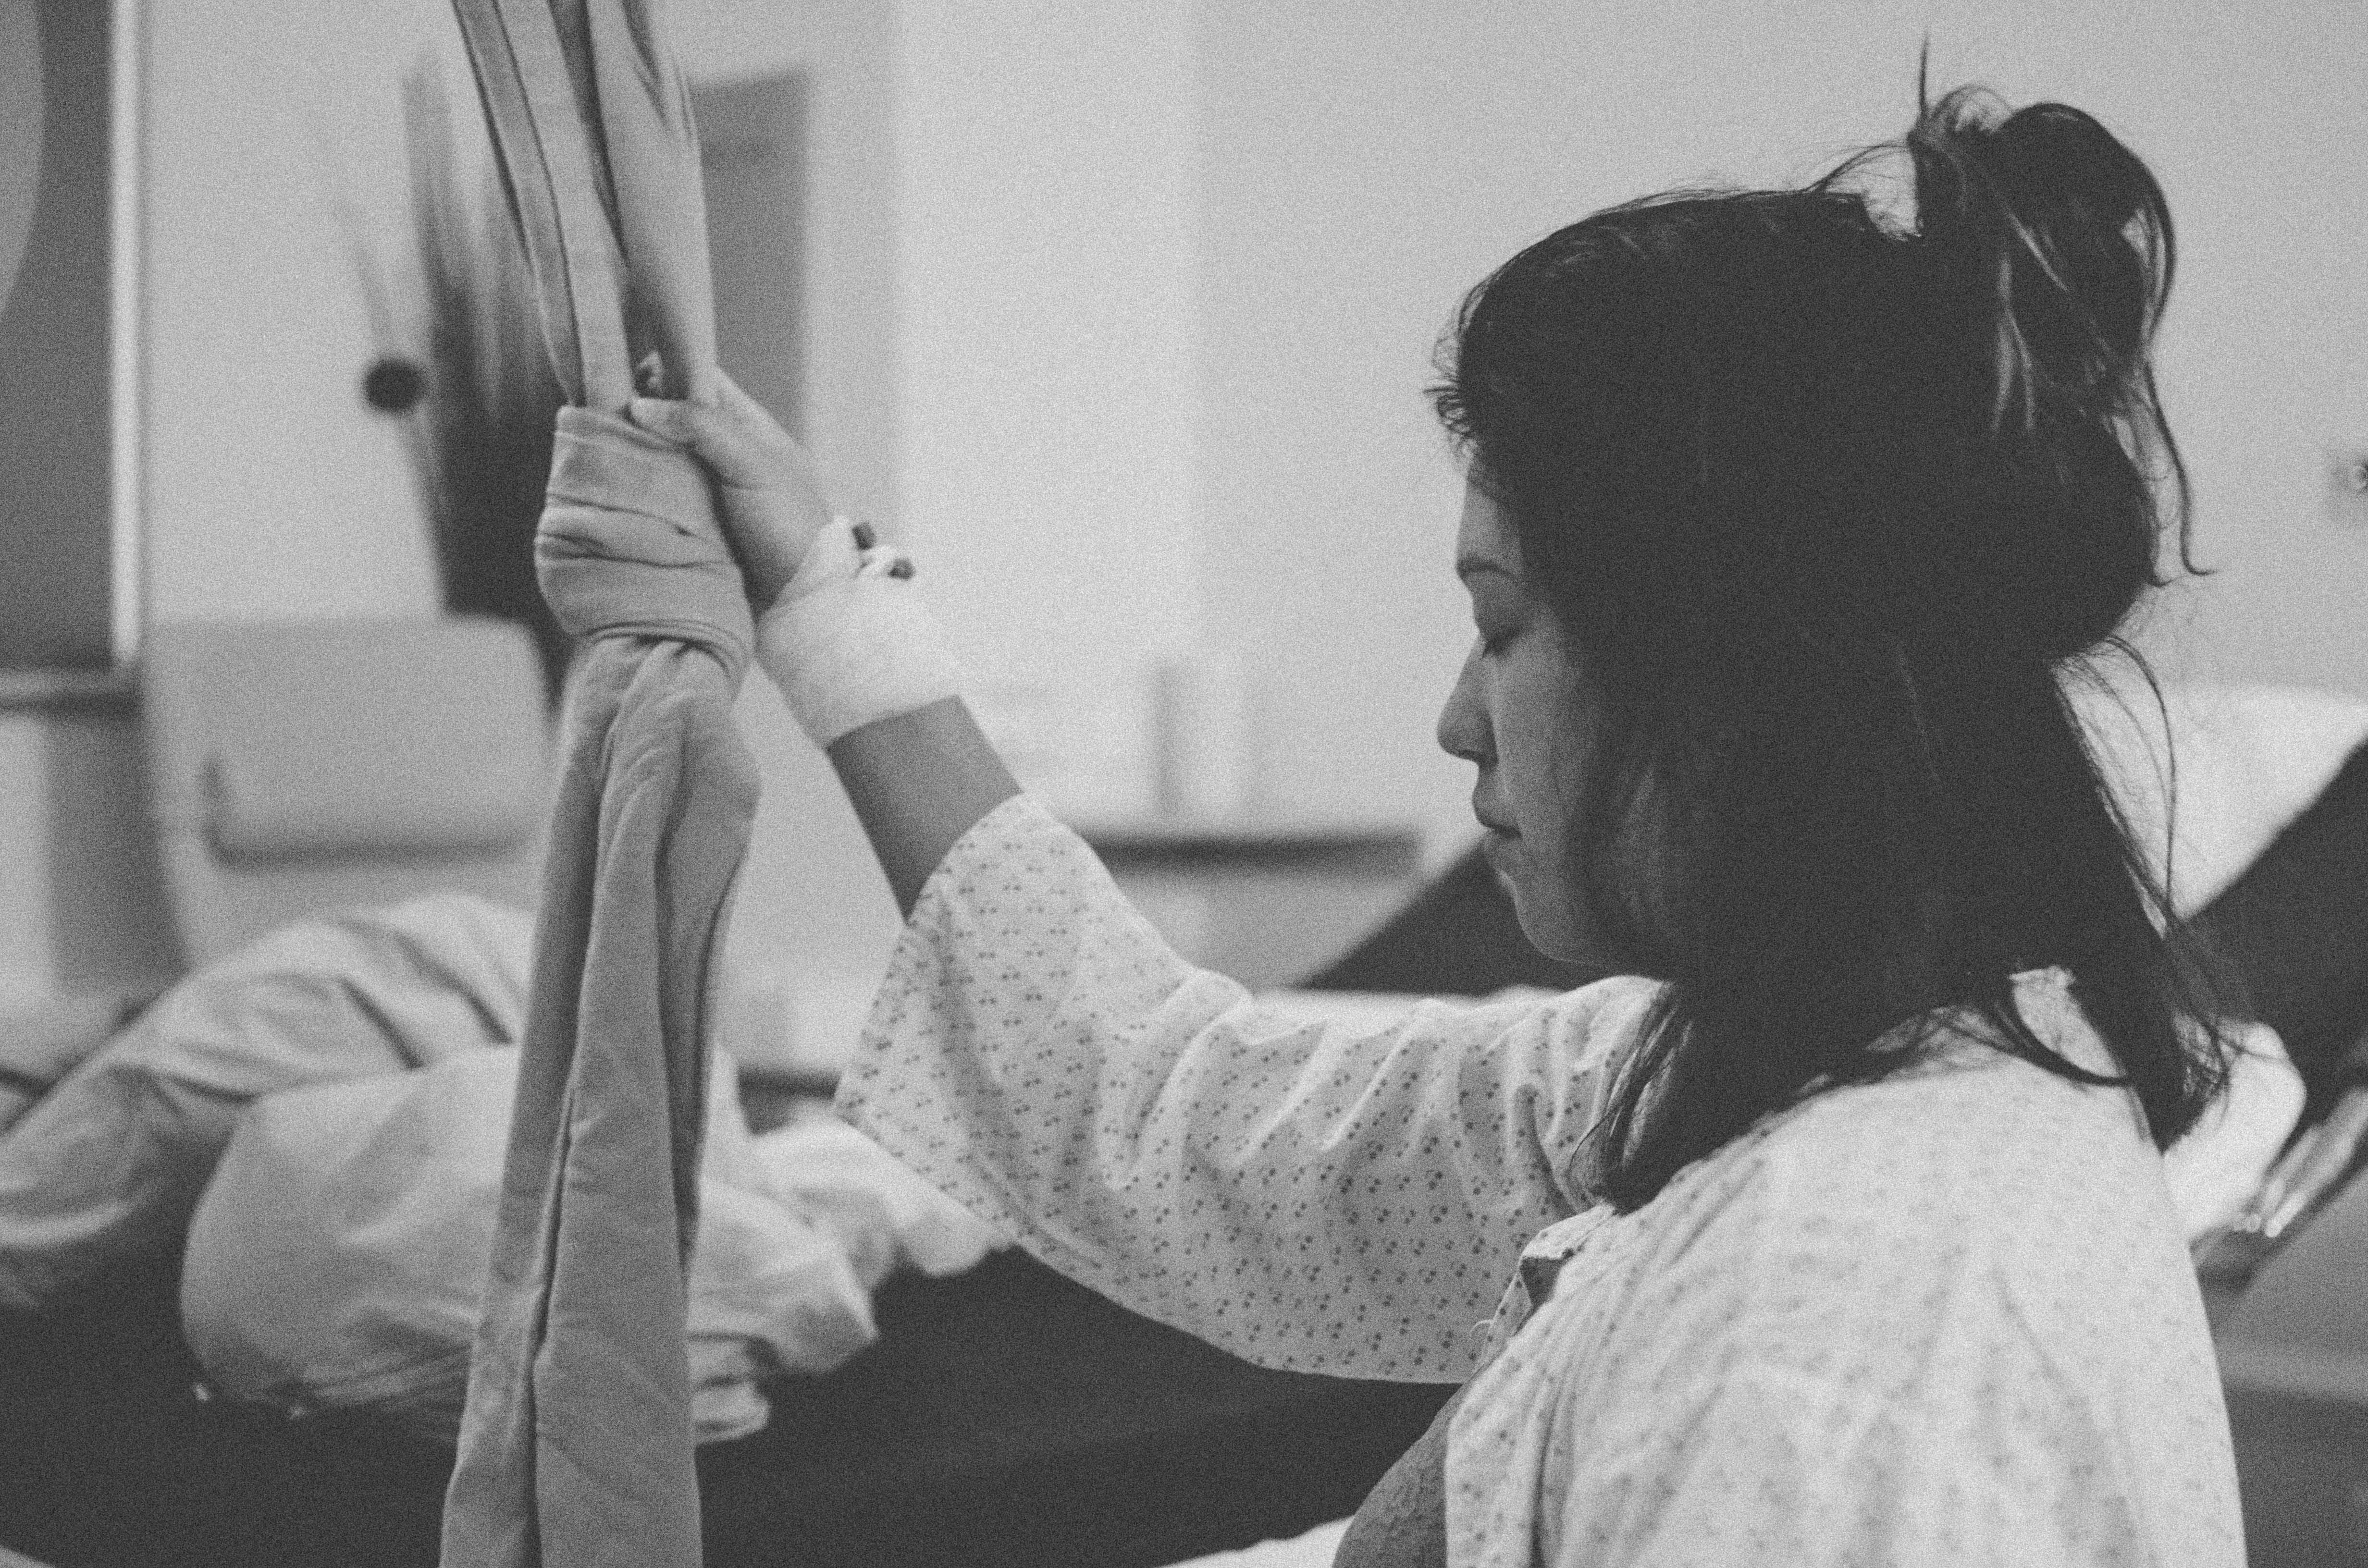 Geburtsfotografie im Krankenhaus , babyfotograf basel